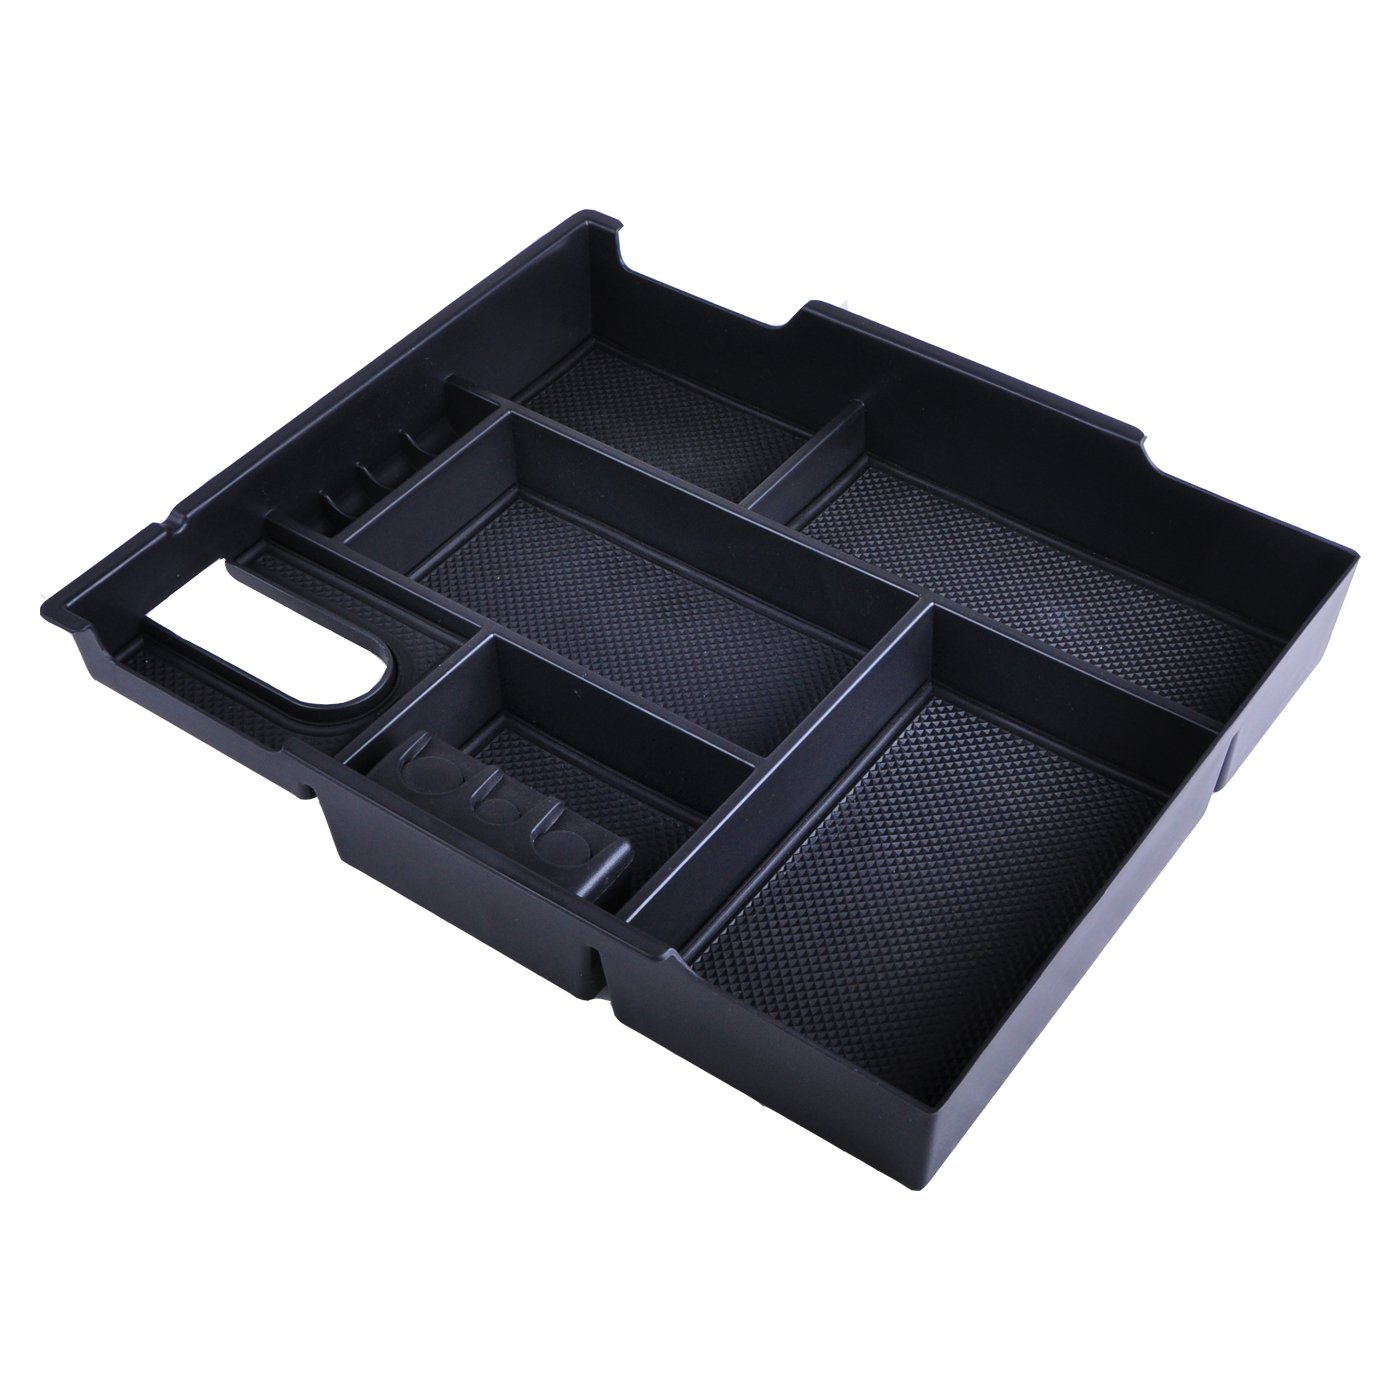 OMOTOR Toyota Center Console Tray Organizer Glove Box Fits for 2014-2018 Tundra, Armrest Secondary Storage Box Tundra